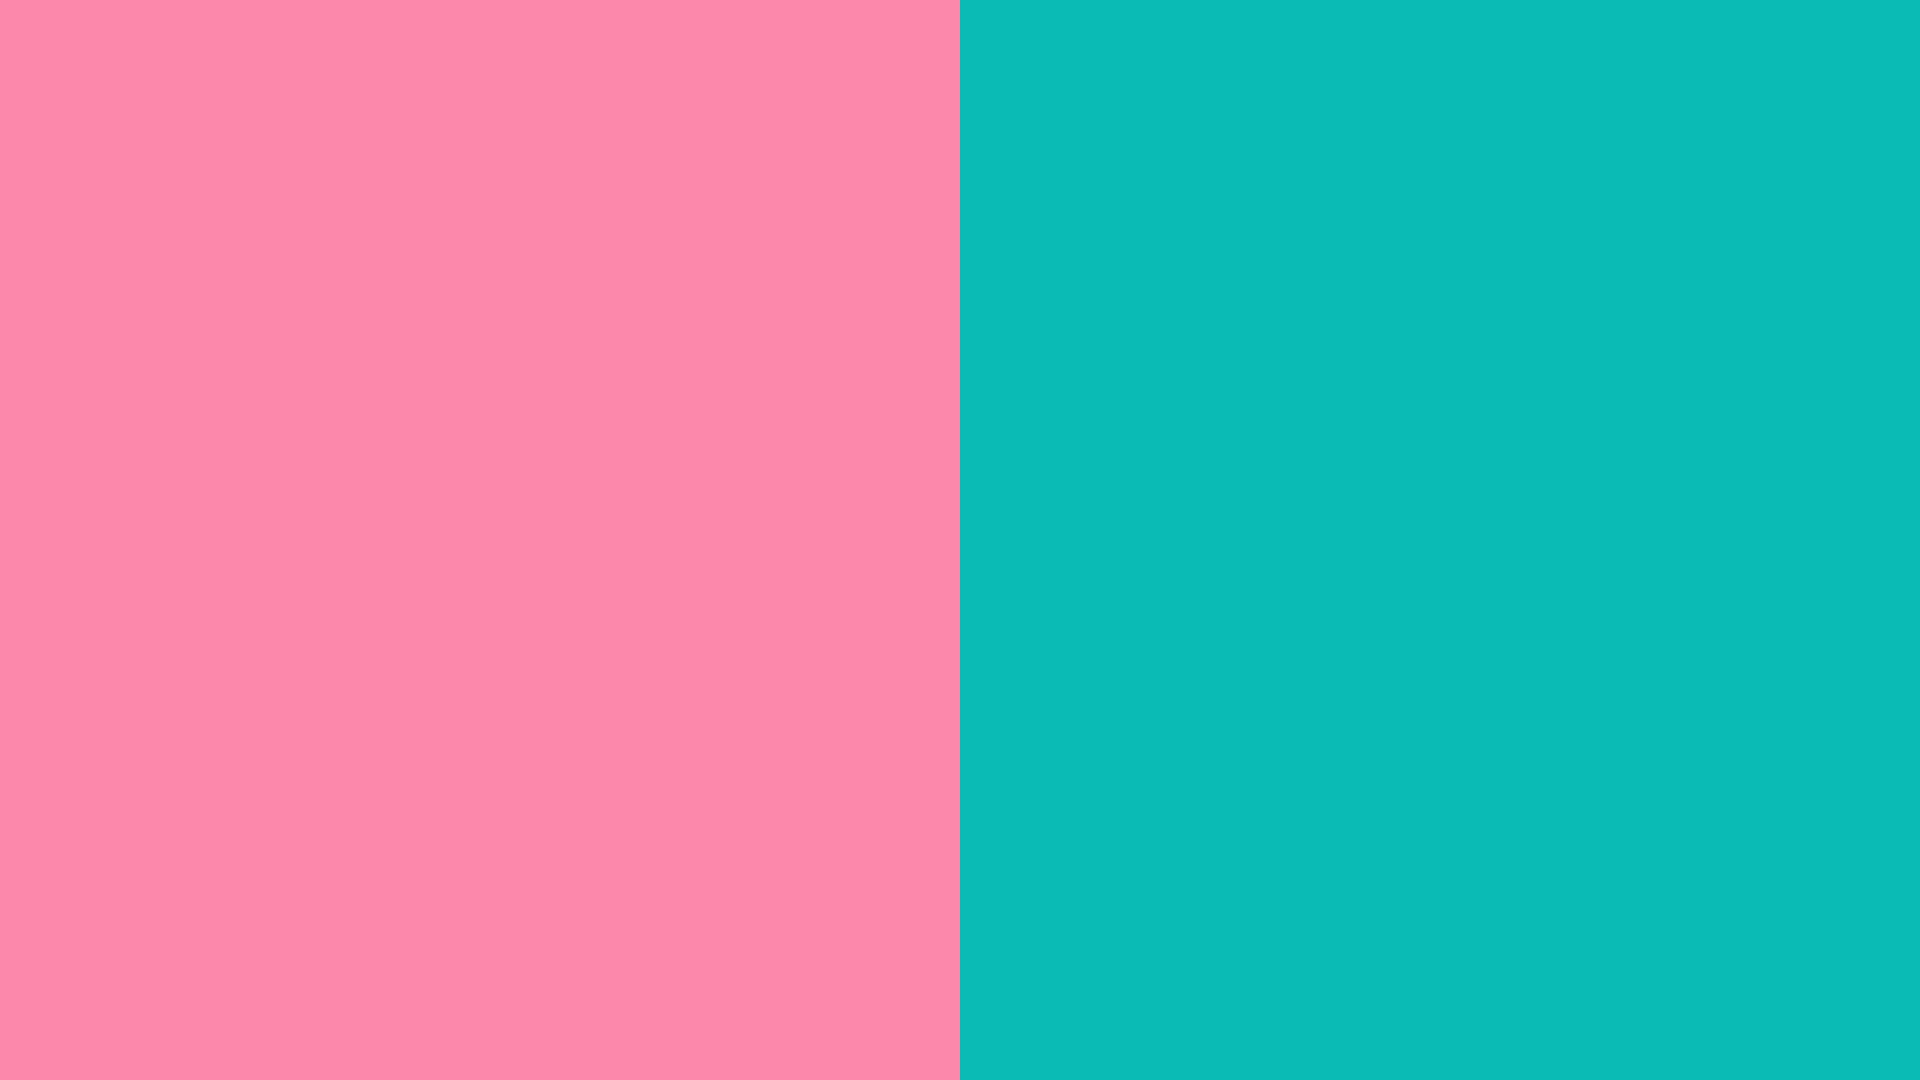 Blue and Pink Wallpapers - WallpaperSafari